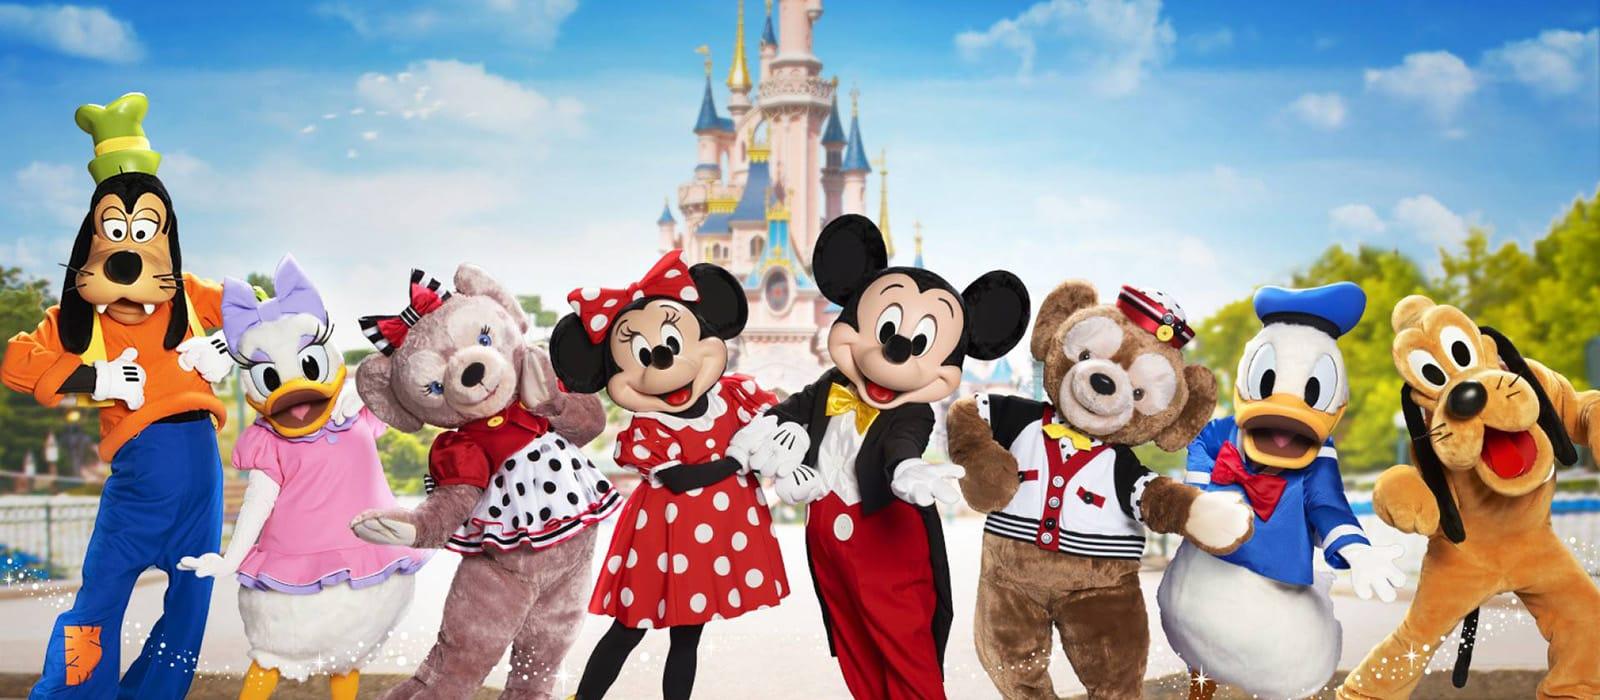 Openingsaanbieding <br> Disneyland Paris